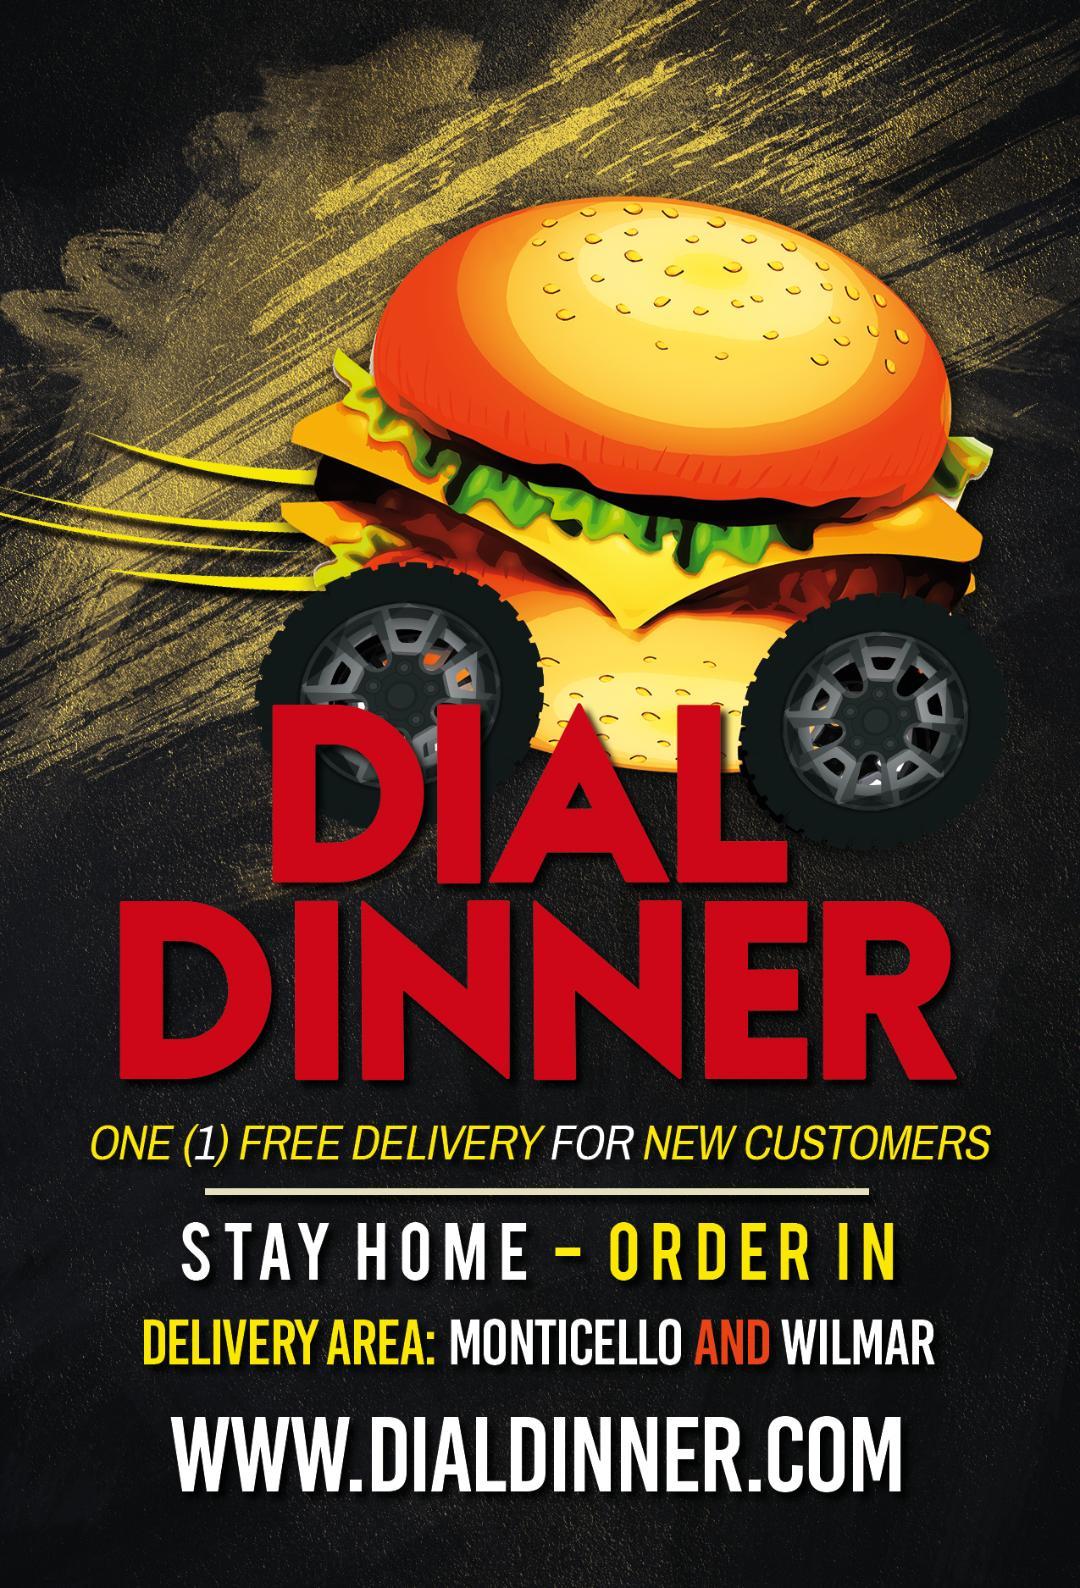 DialDinnerFlyer